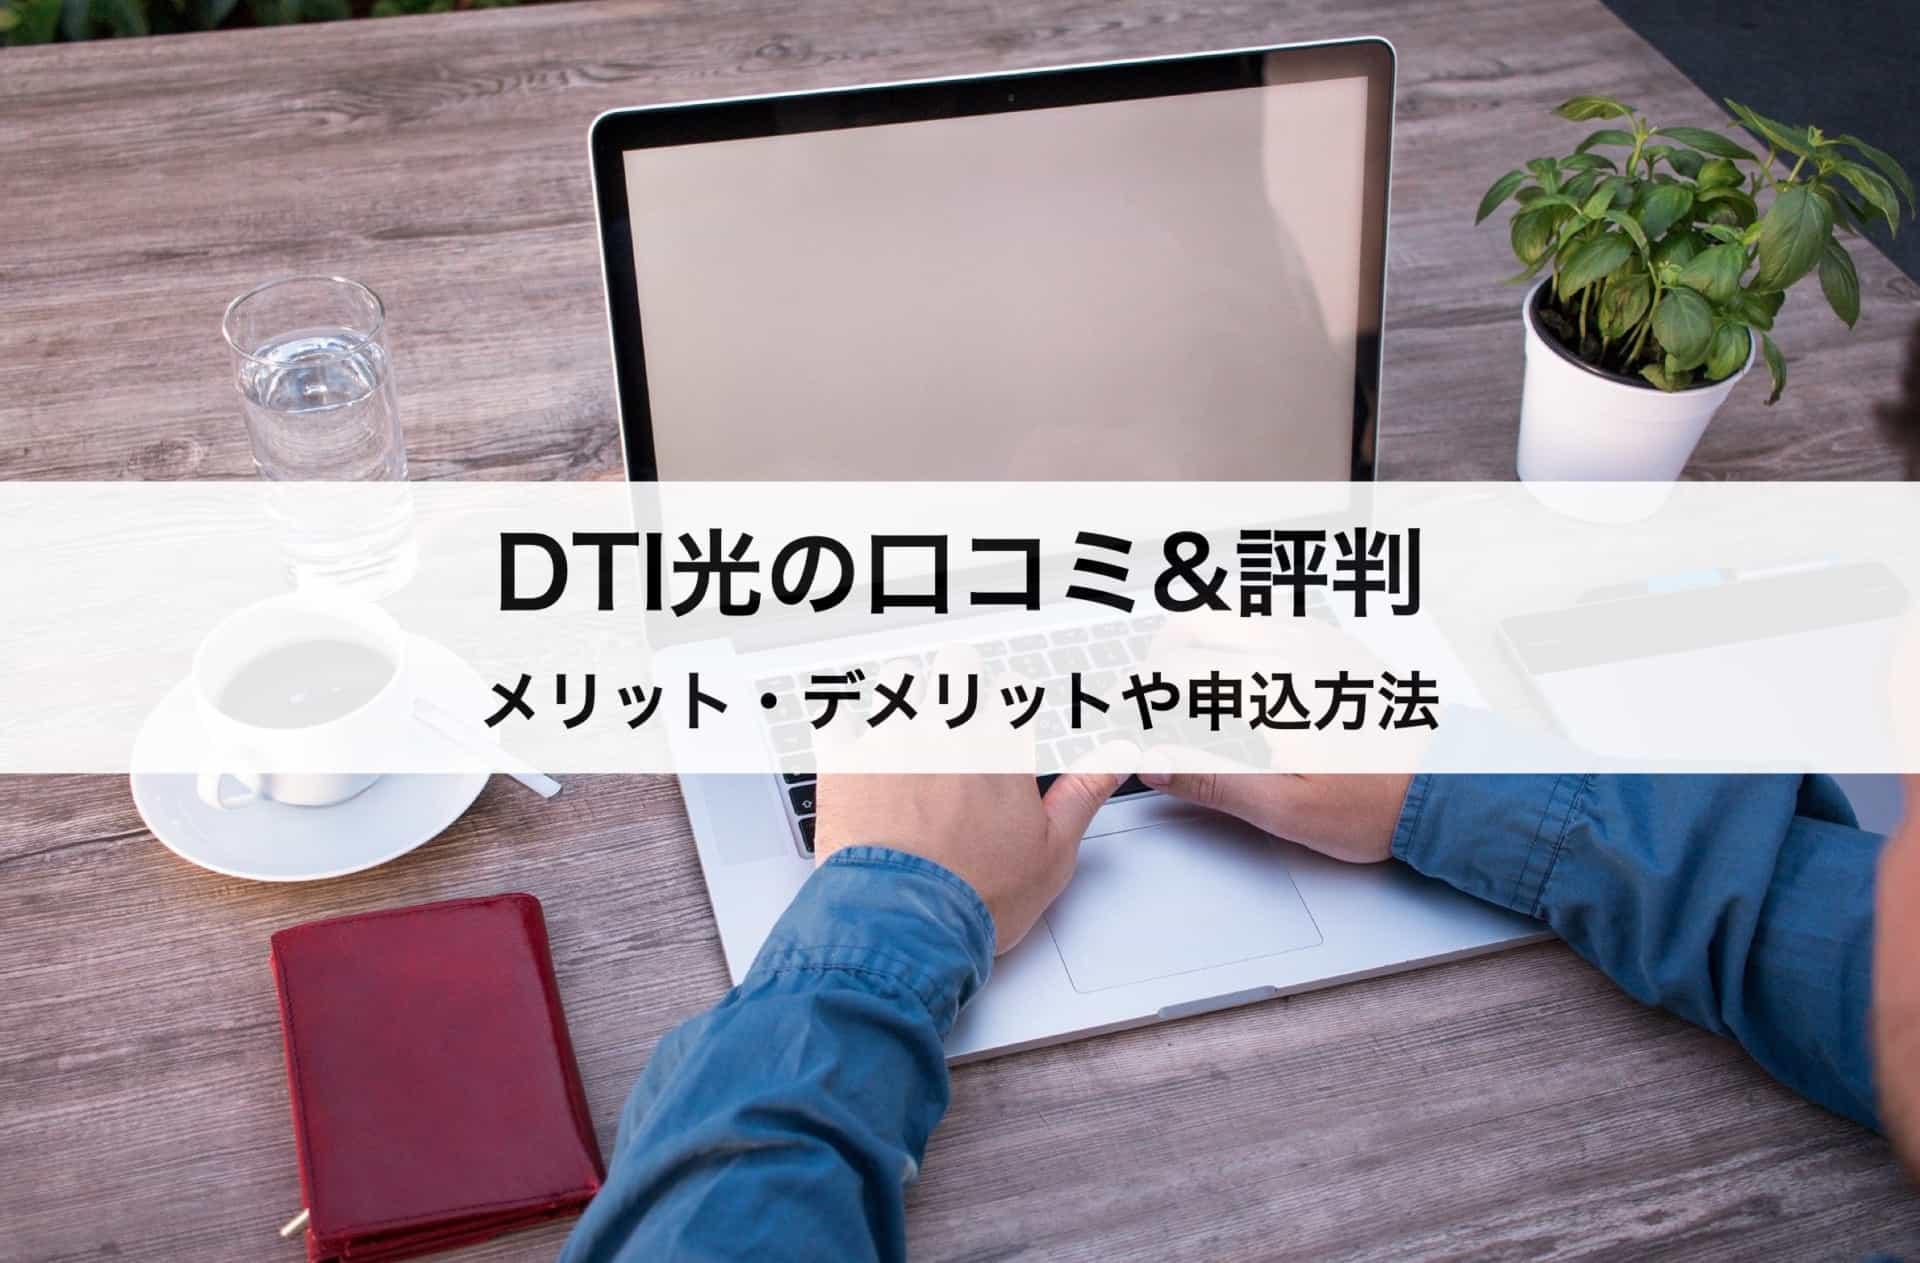 DTI光の口コミ&評判|メリット・デメリットや申込方法まで徹底解説!